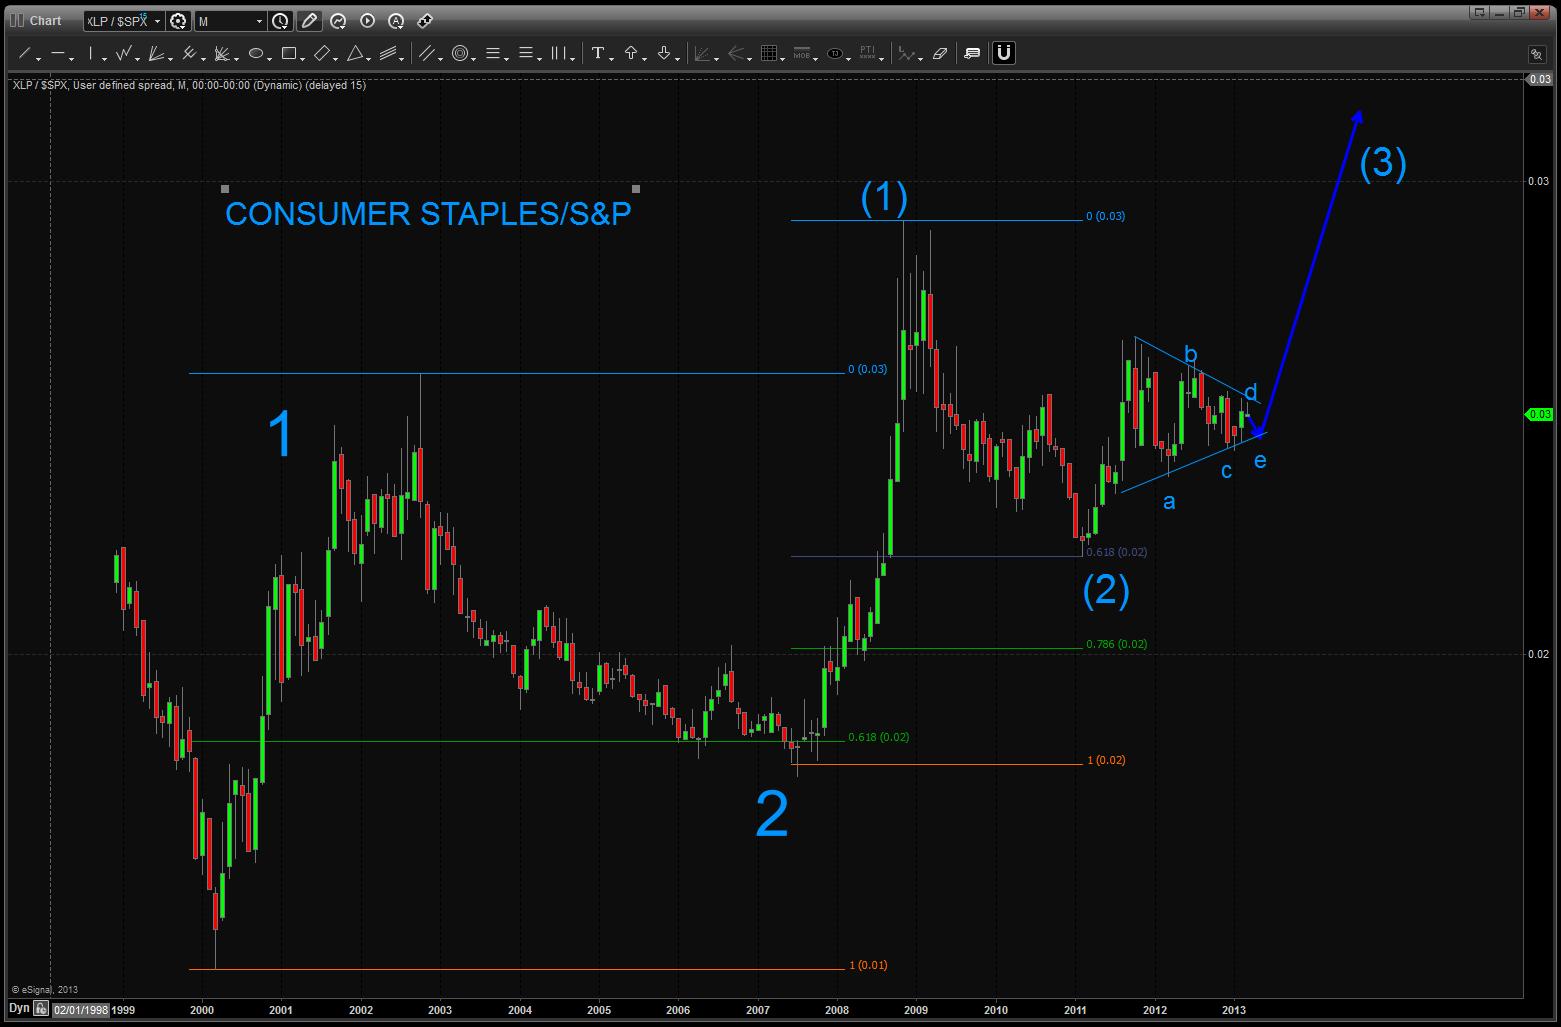 Staples S&P Ration current